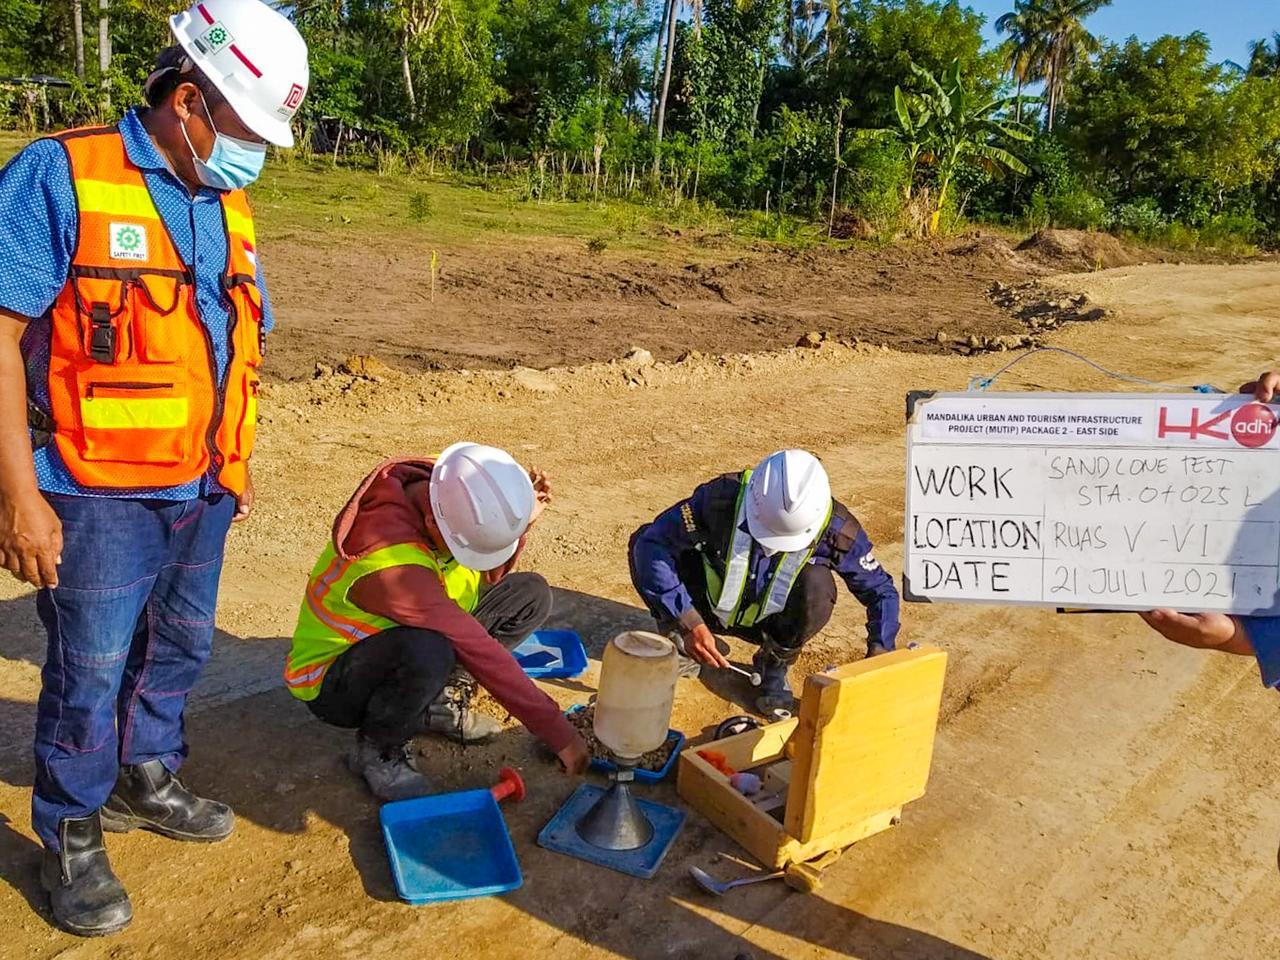 Realisasi Mandalika Urban Tourism And Infrastructure Project (MUTIP) Mulai Bergulir